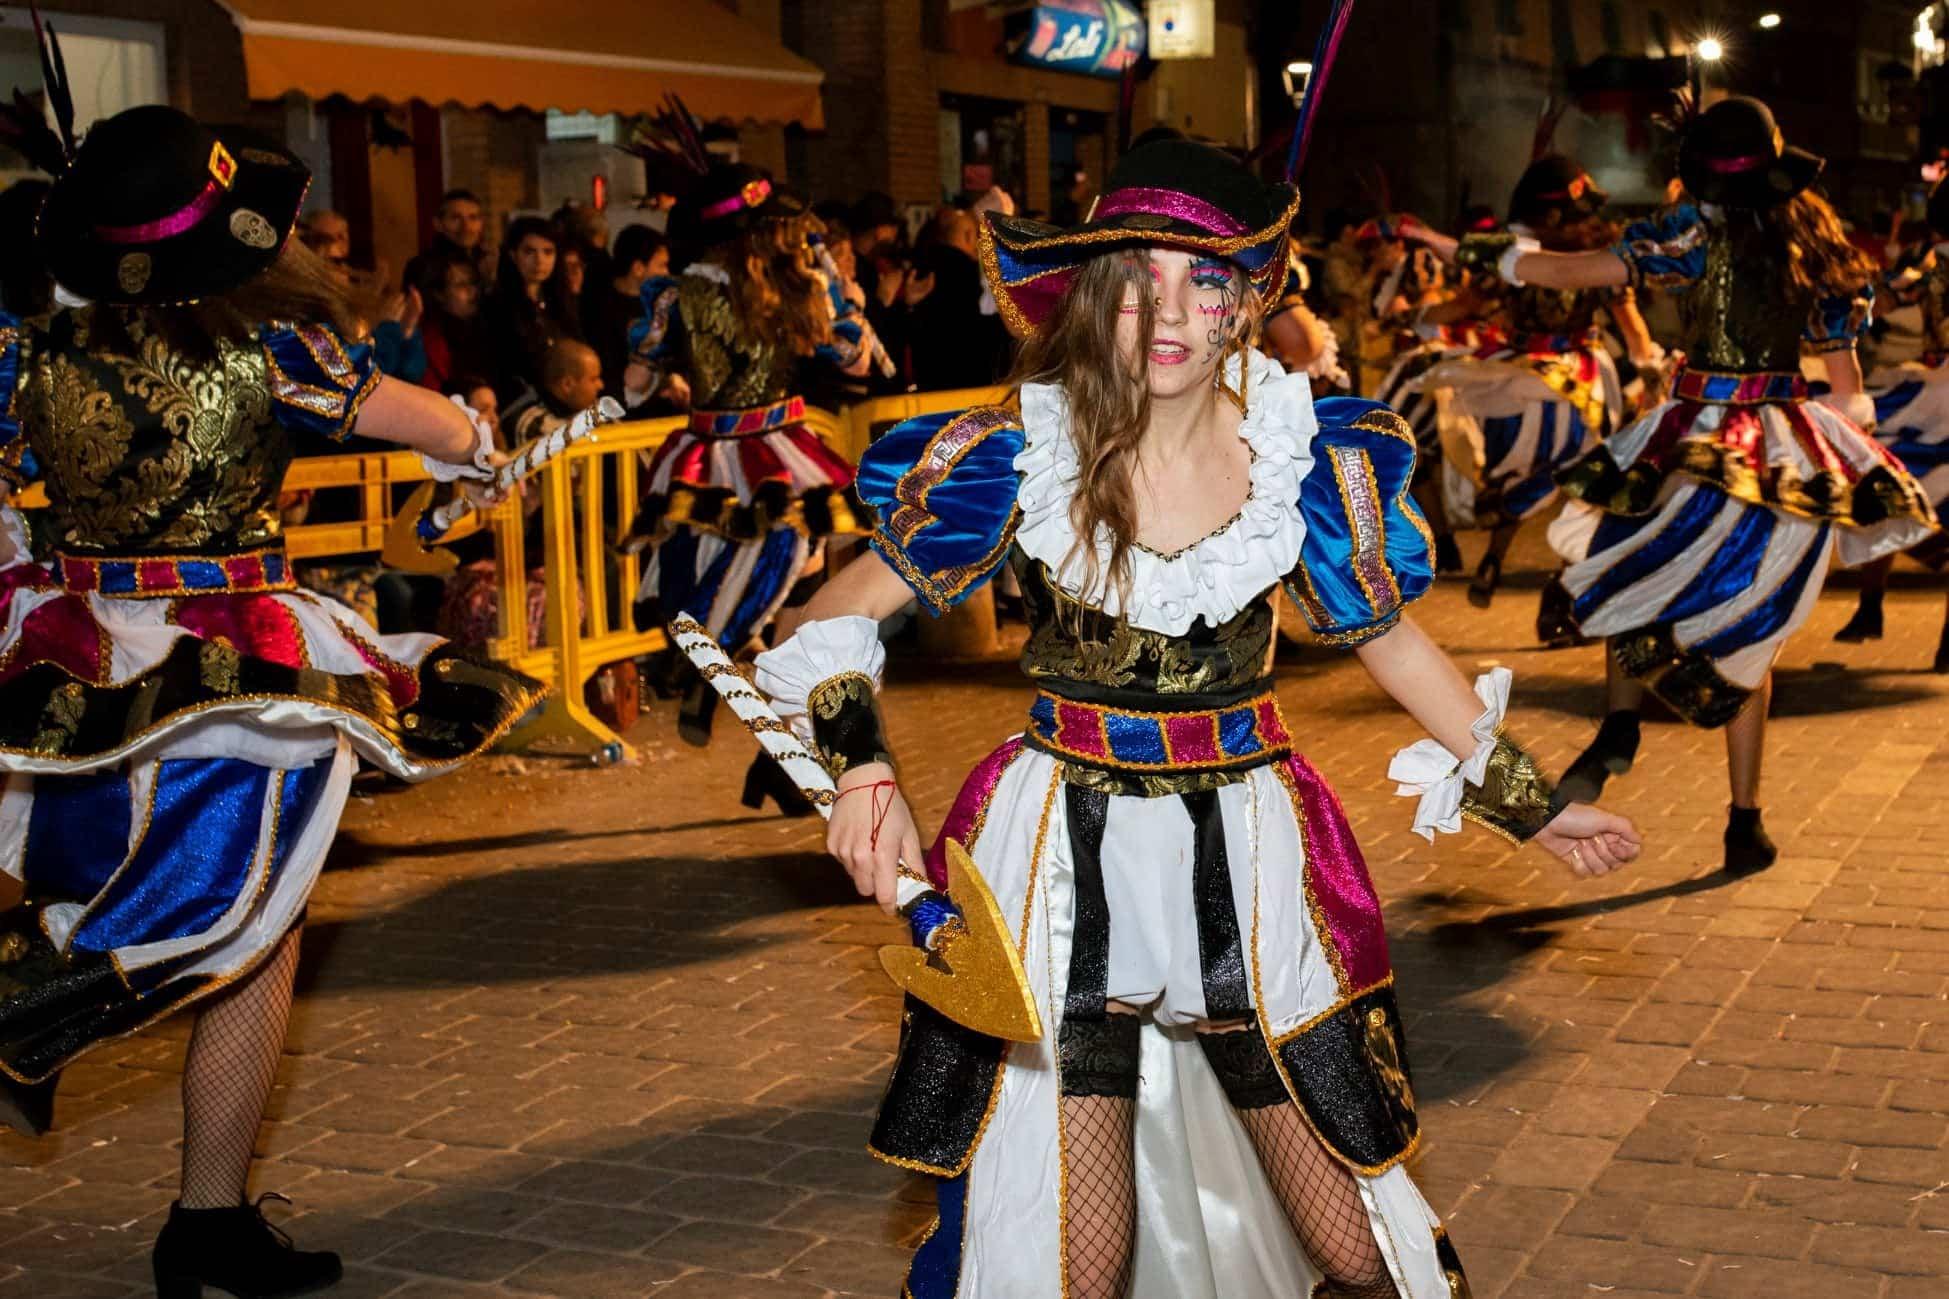 Carnaval de herencia 2020 ofertorio 122 - Selección de fotografías del Ofertorio del Carnaval de Herencia